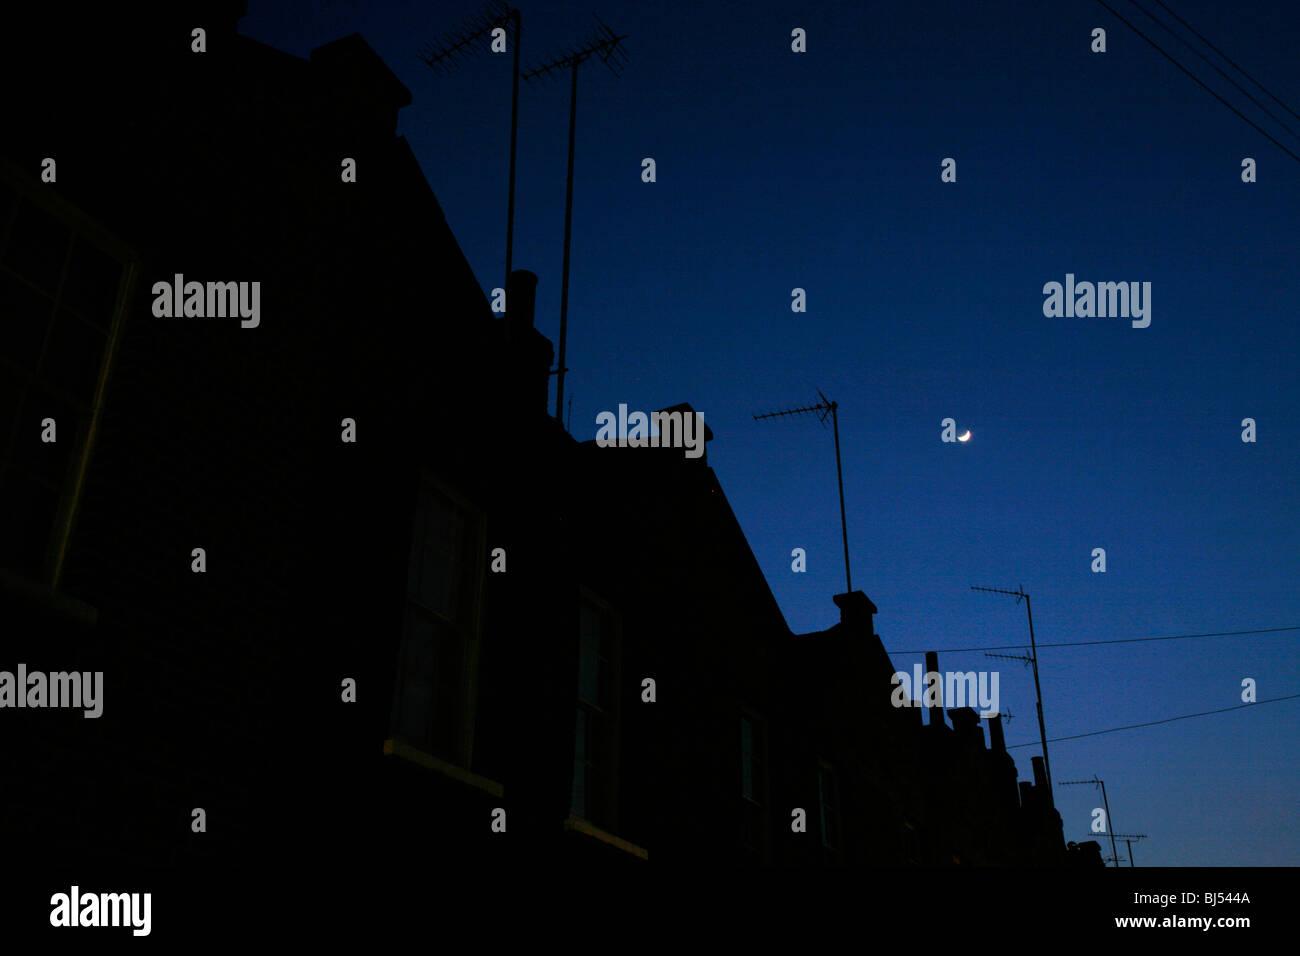 Crescent moon shining above Roupell Street, Waterloo, London, UK - Stock Image